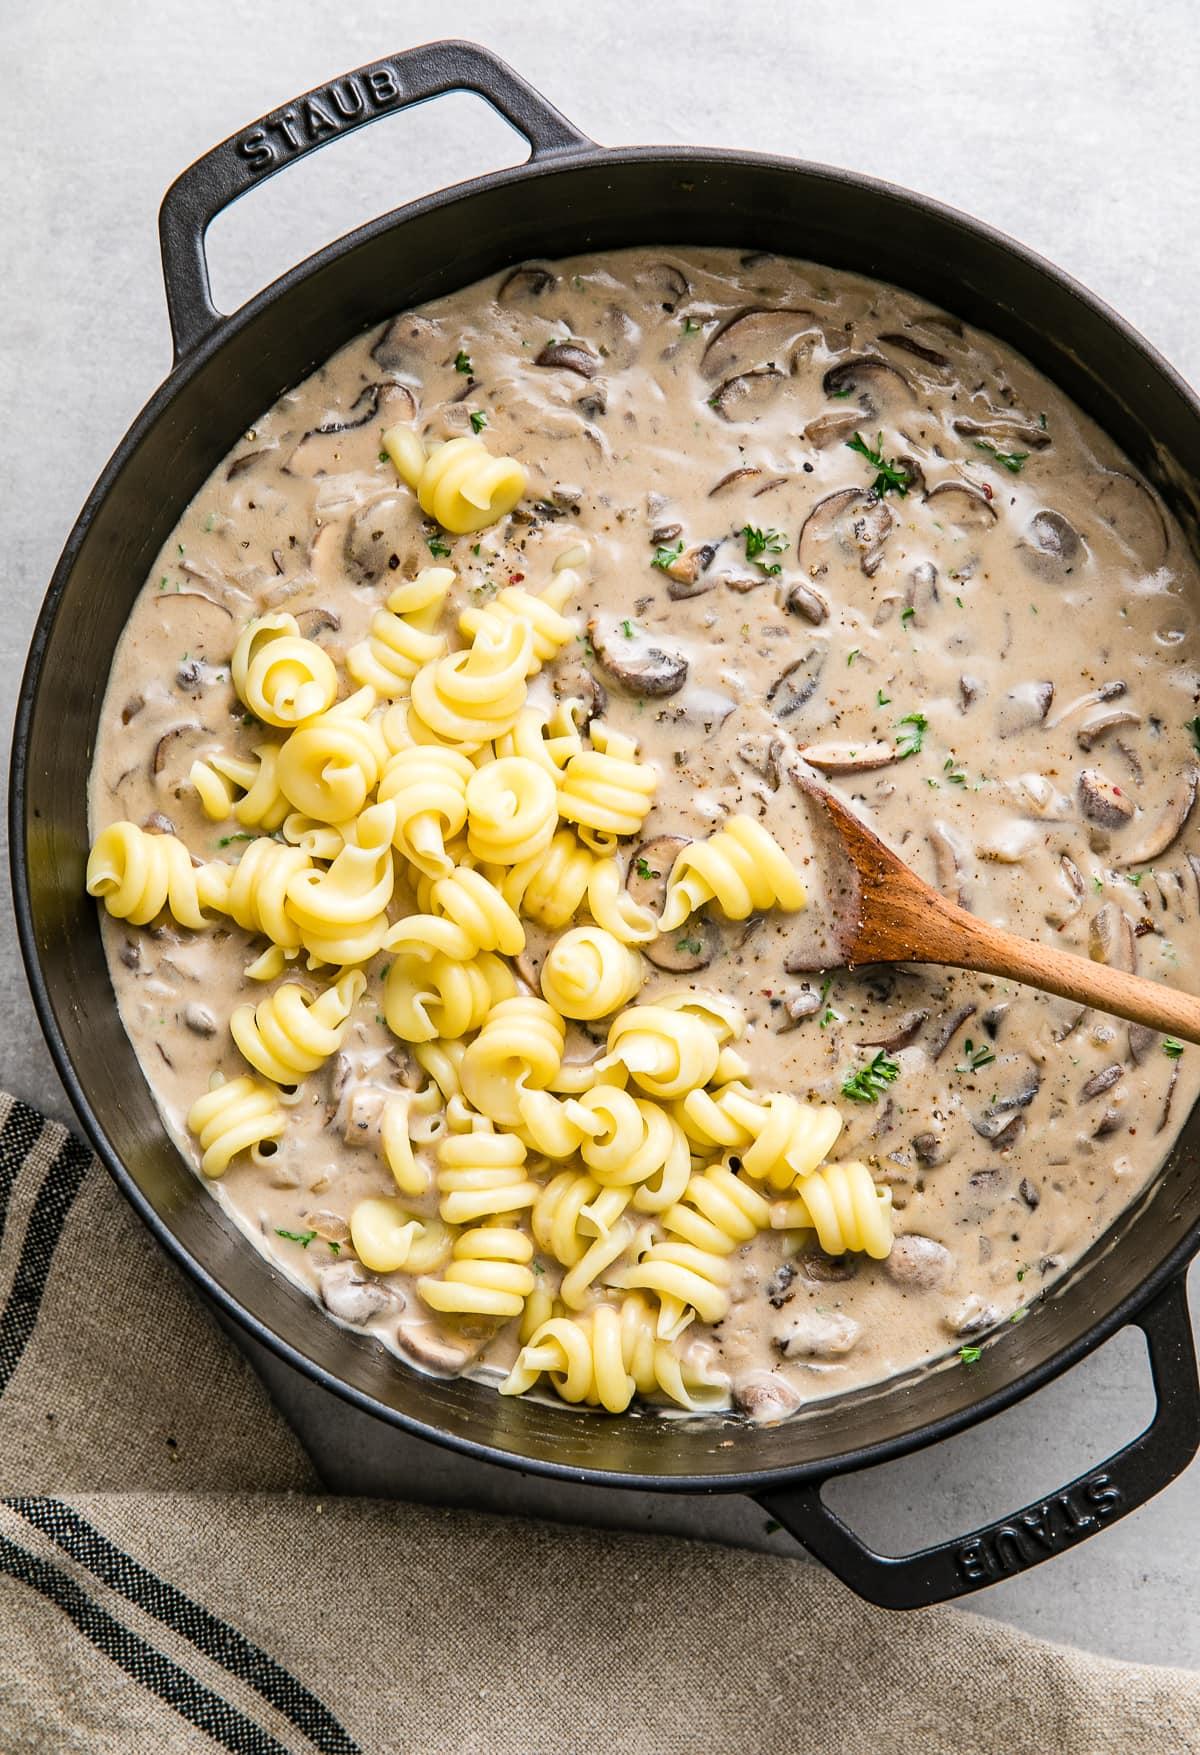 top down view of pasta added to creamy vegan mushroom stroganoff in a black pot.